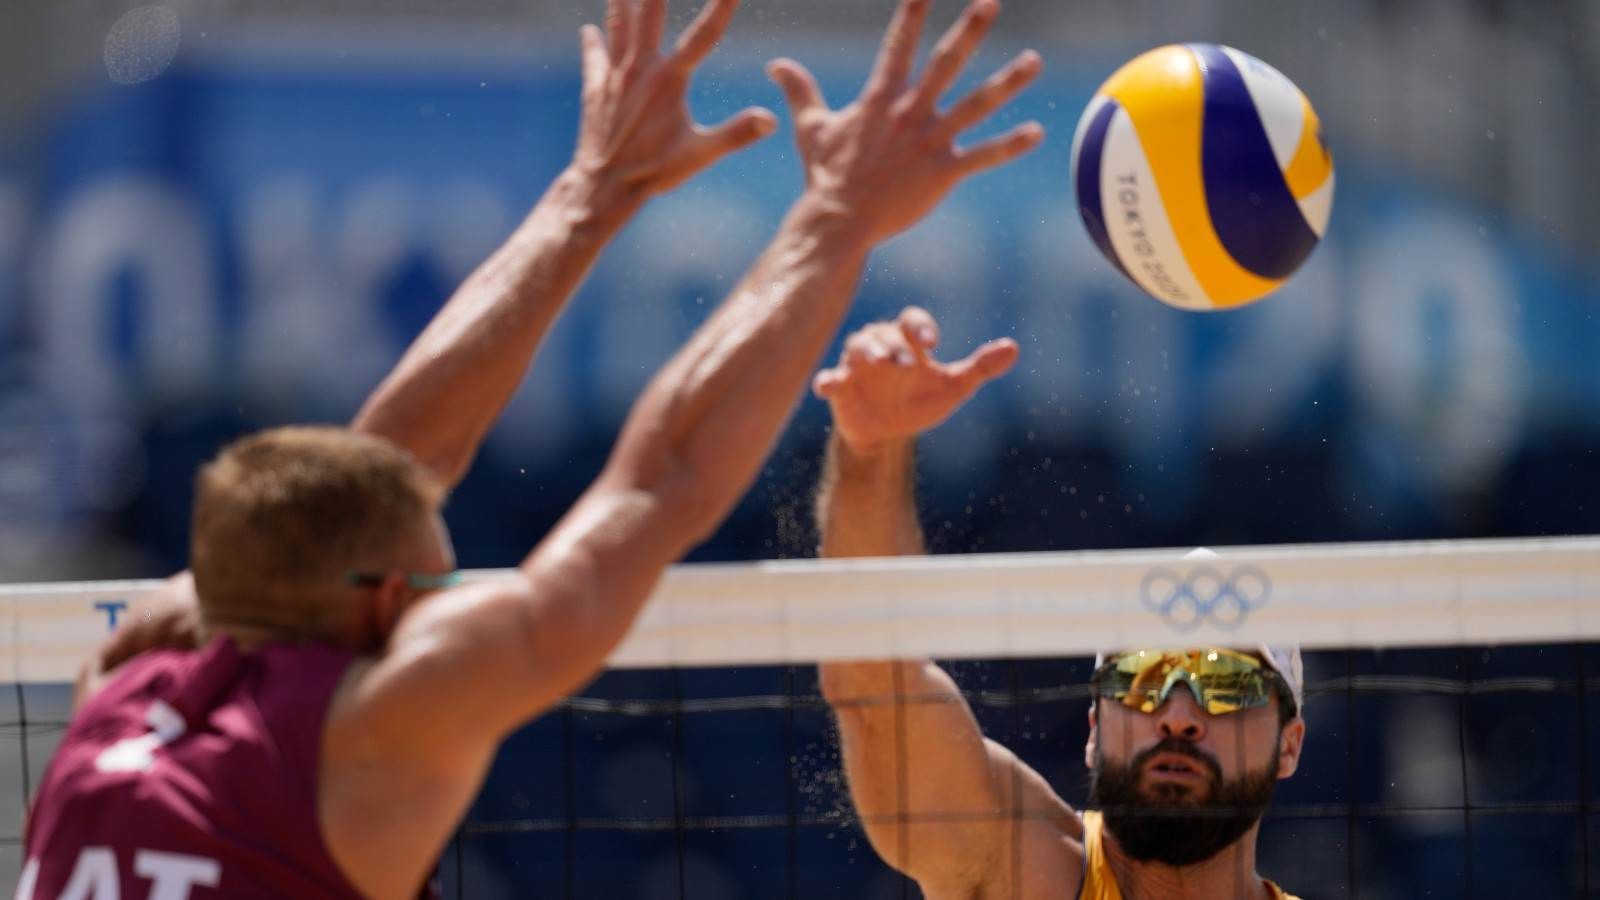 Bruno Schmidt ataca durante partida contra dupla da Letônia nas Olimpíadas